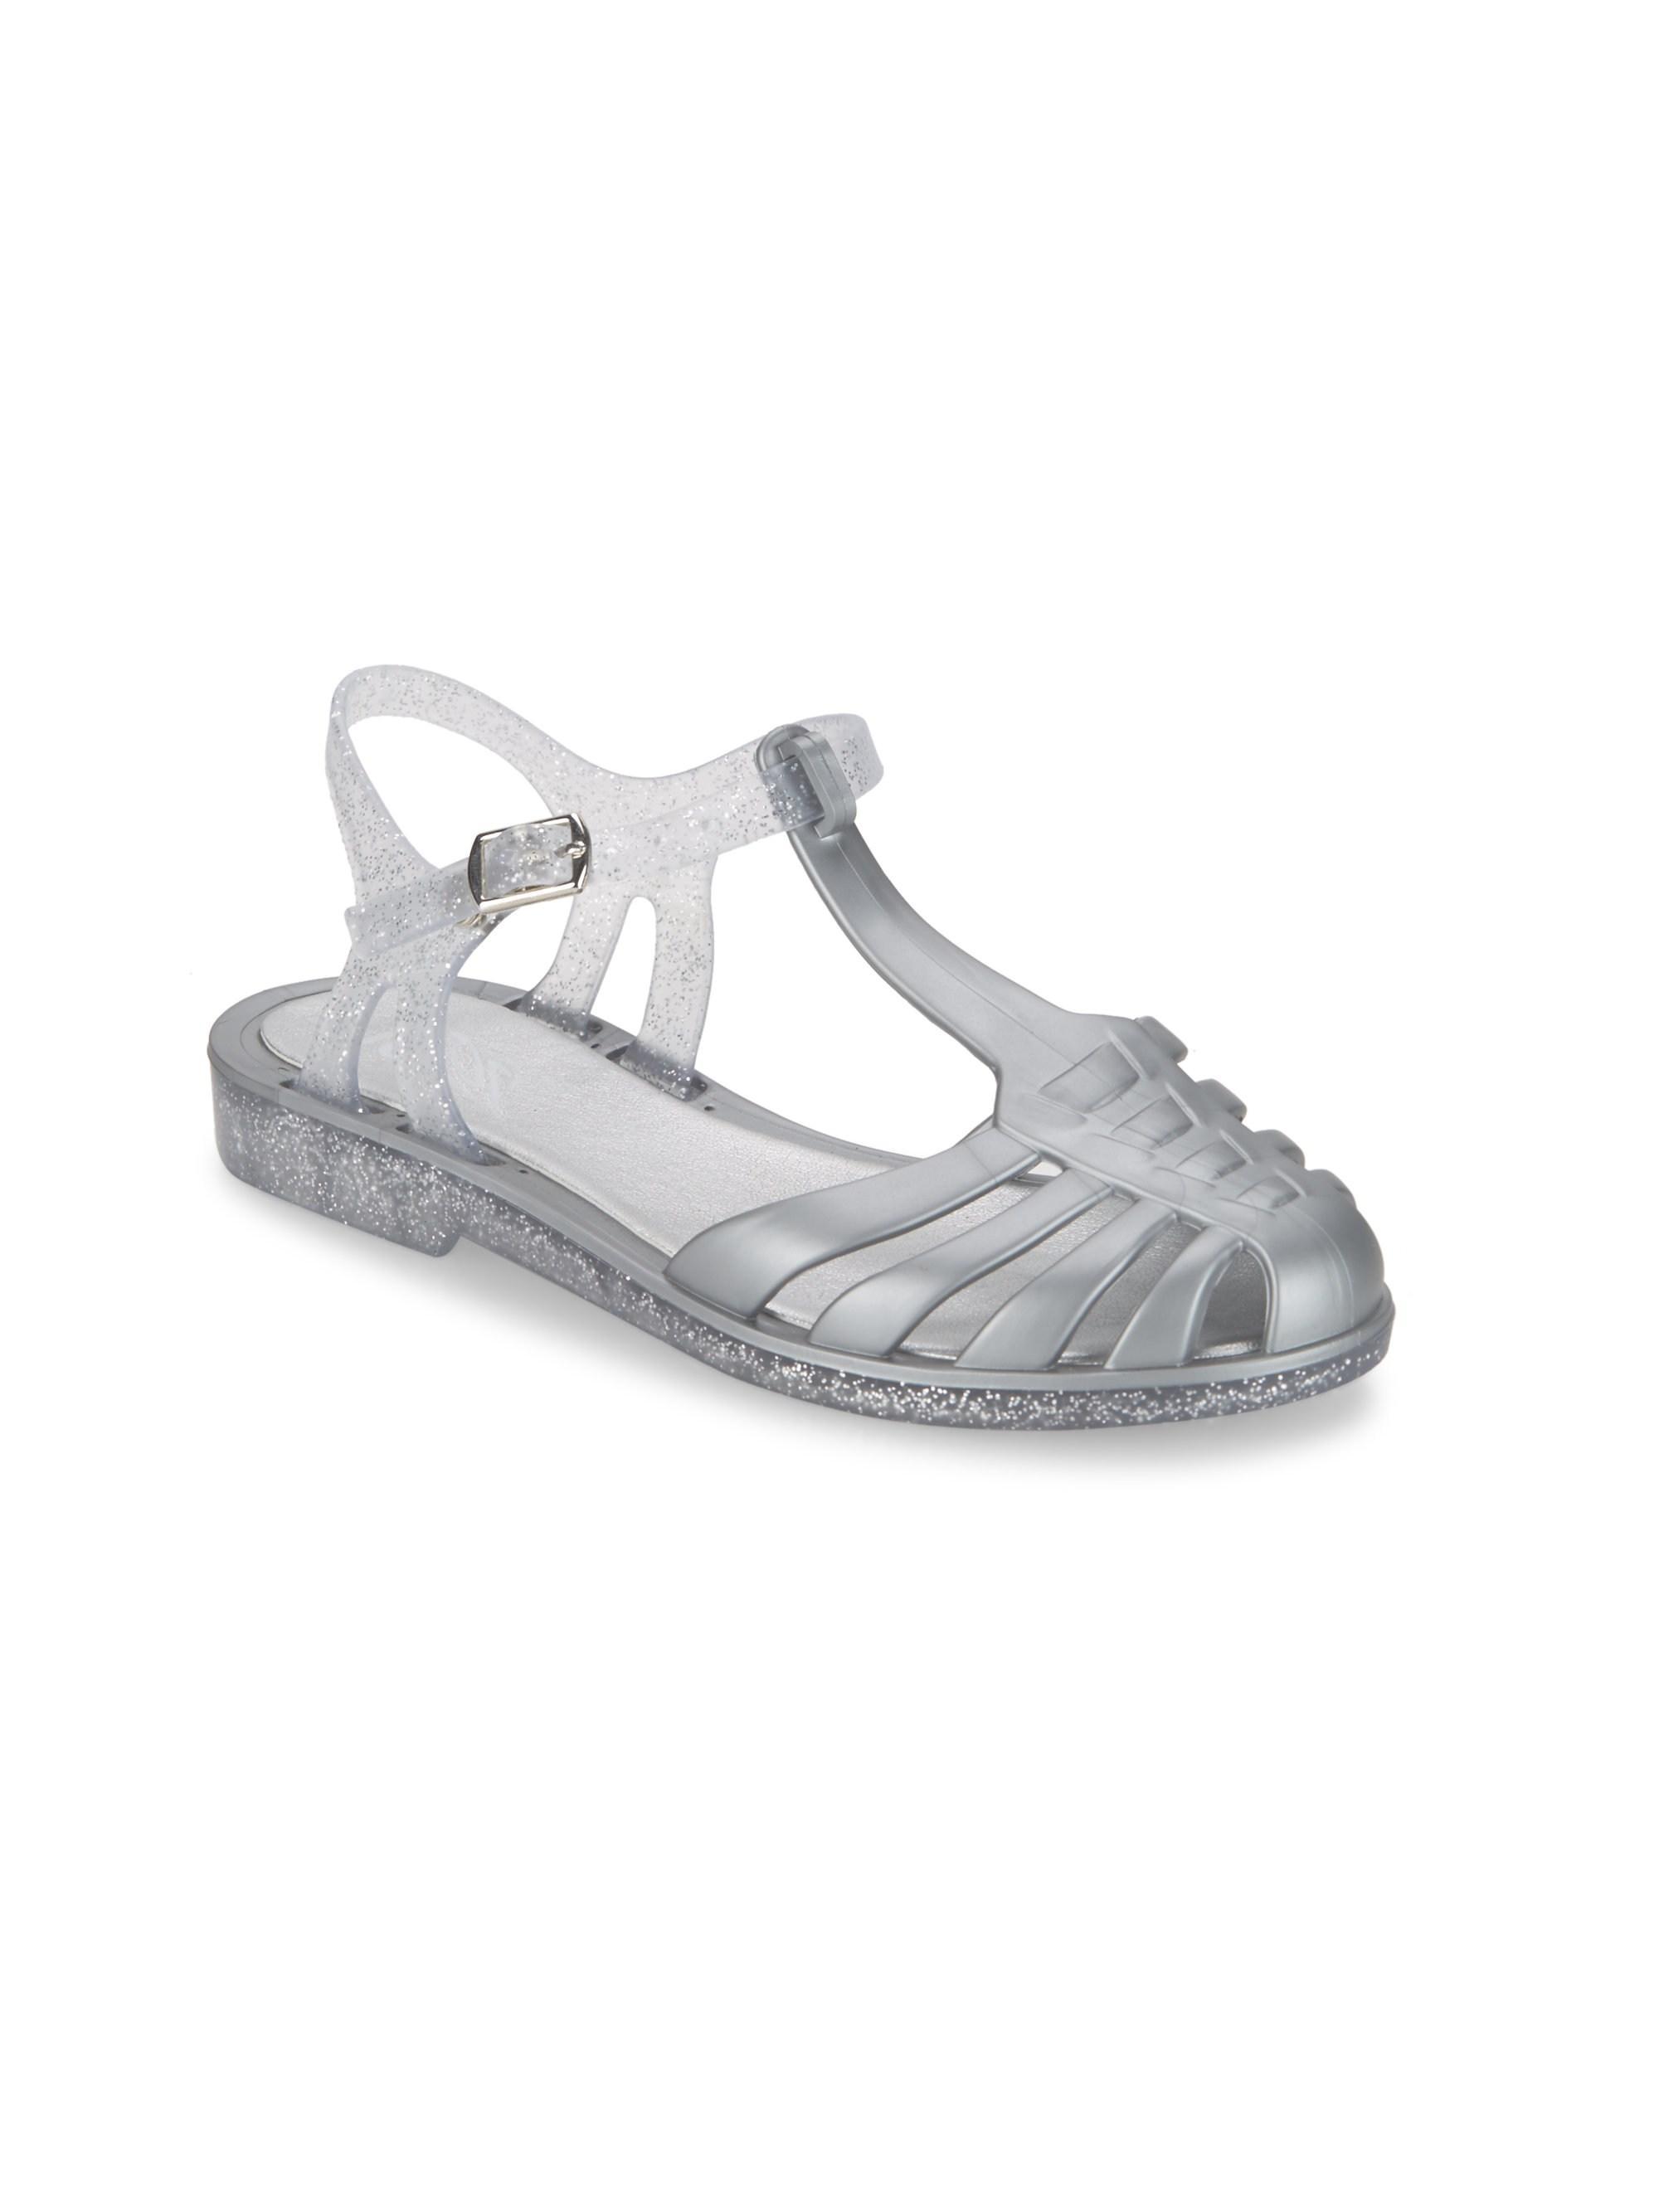 74d3eaa0140b IGOR Little Girl s   Girl s Laida Mini Jelly Sandals - Silver in ...